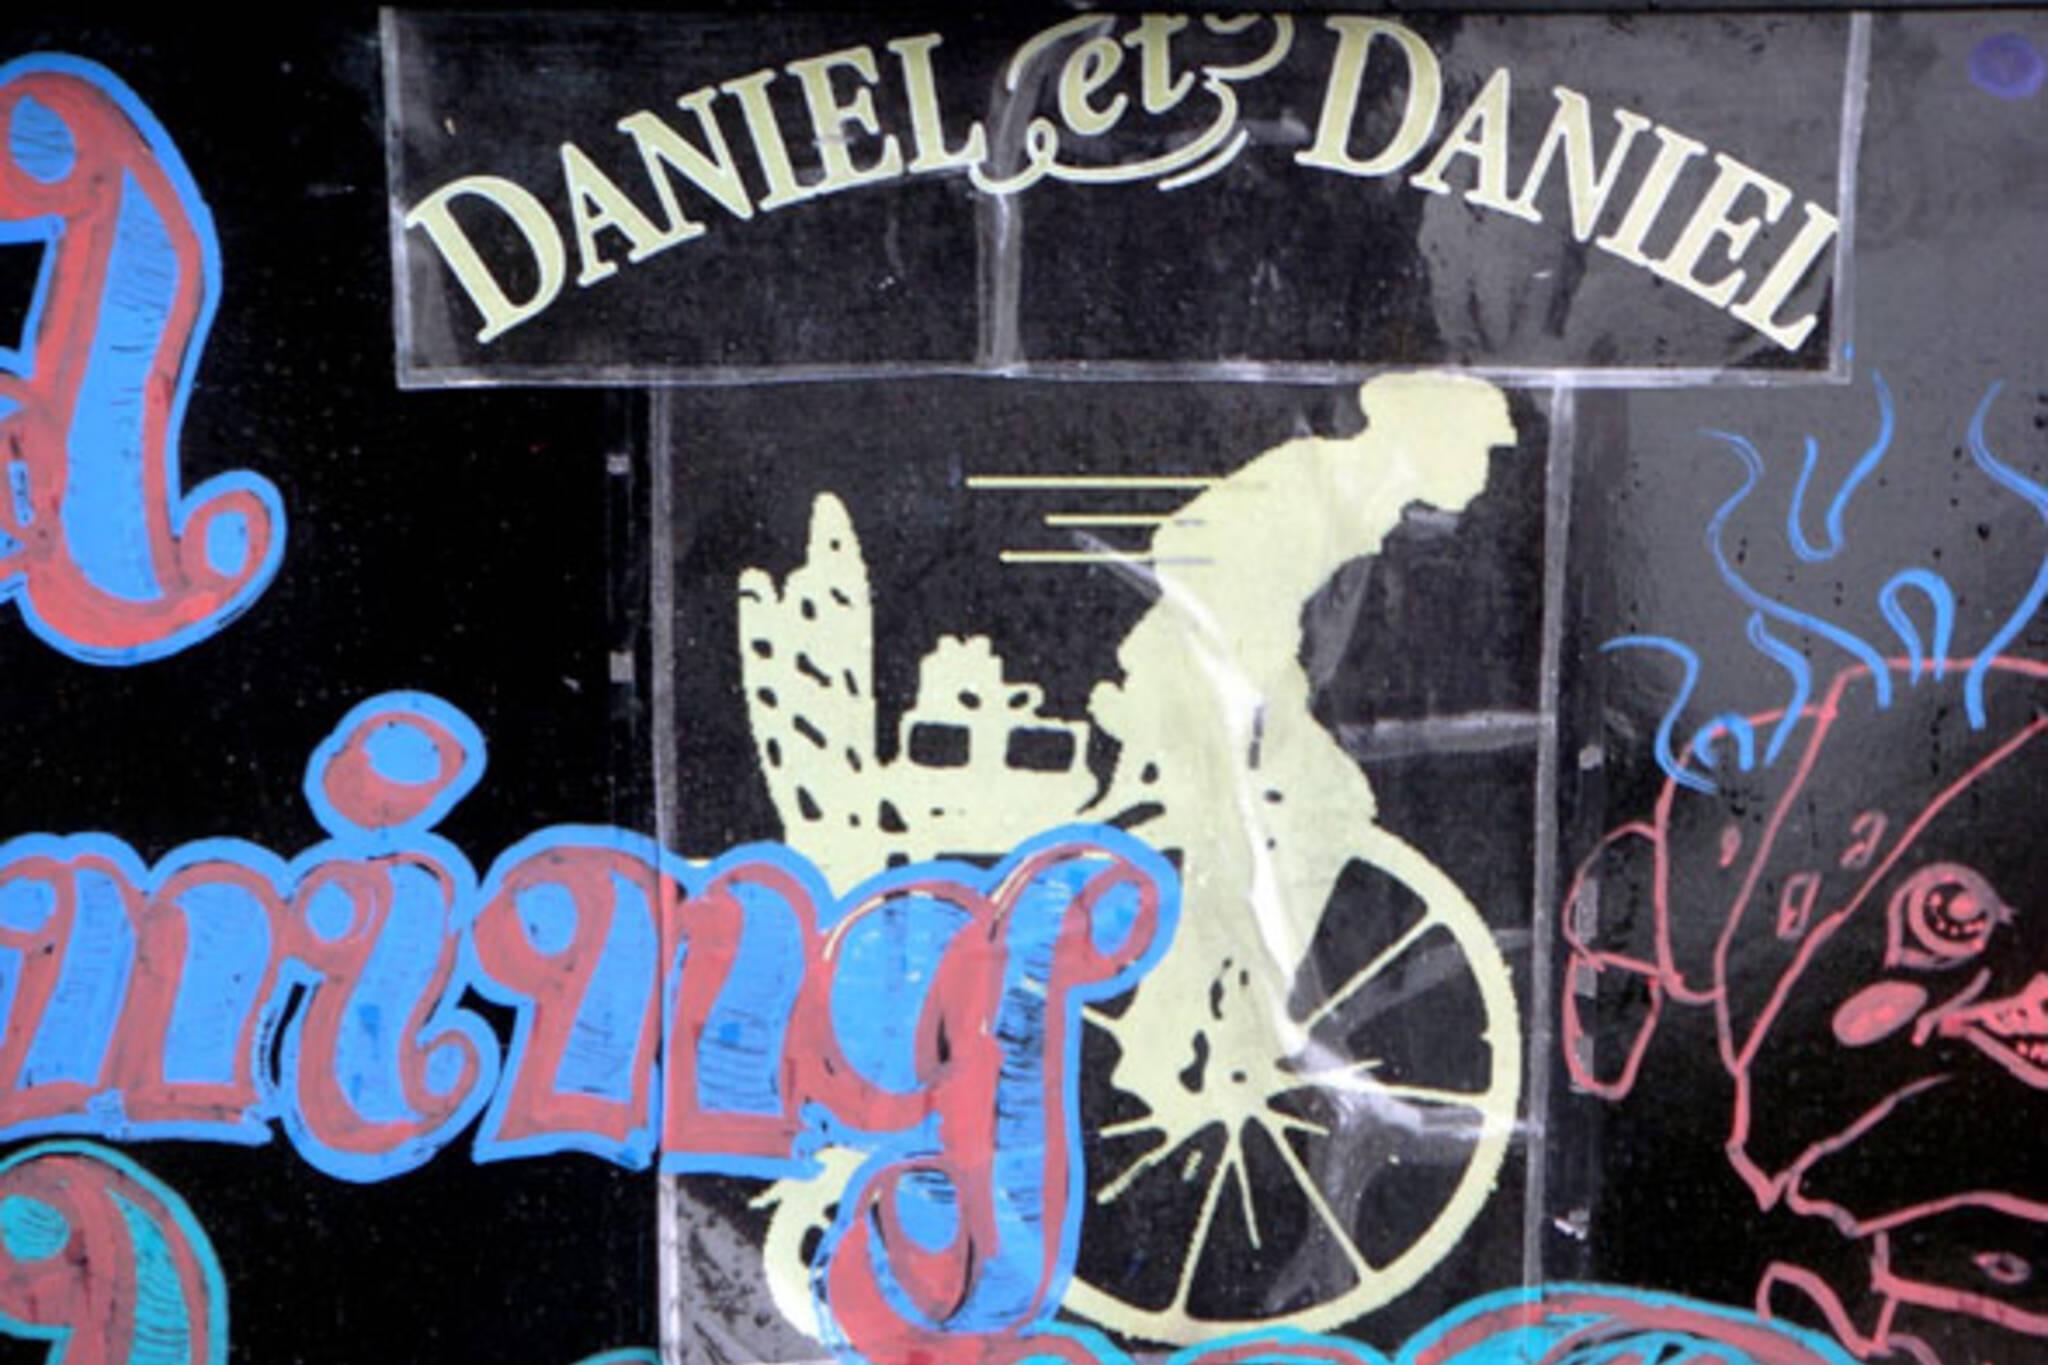 Daniel et Daniel